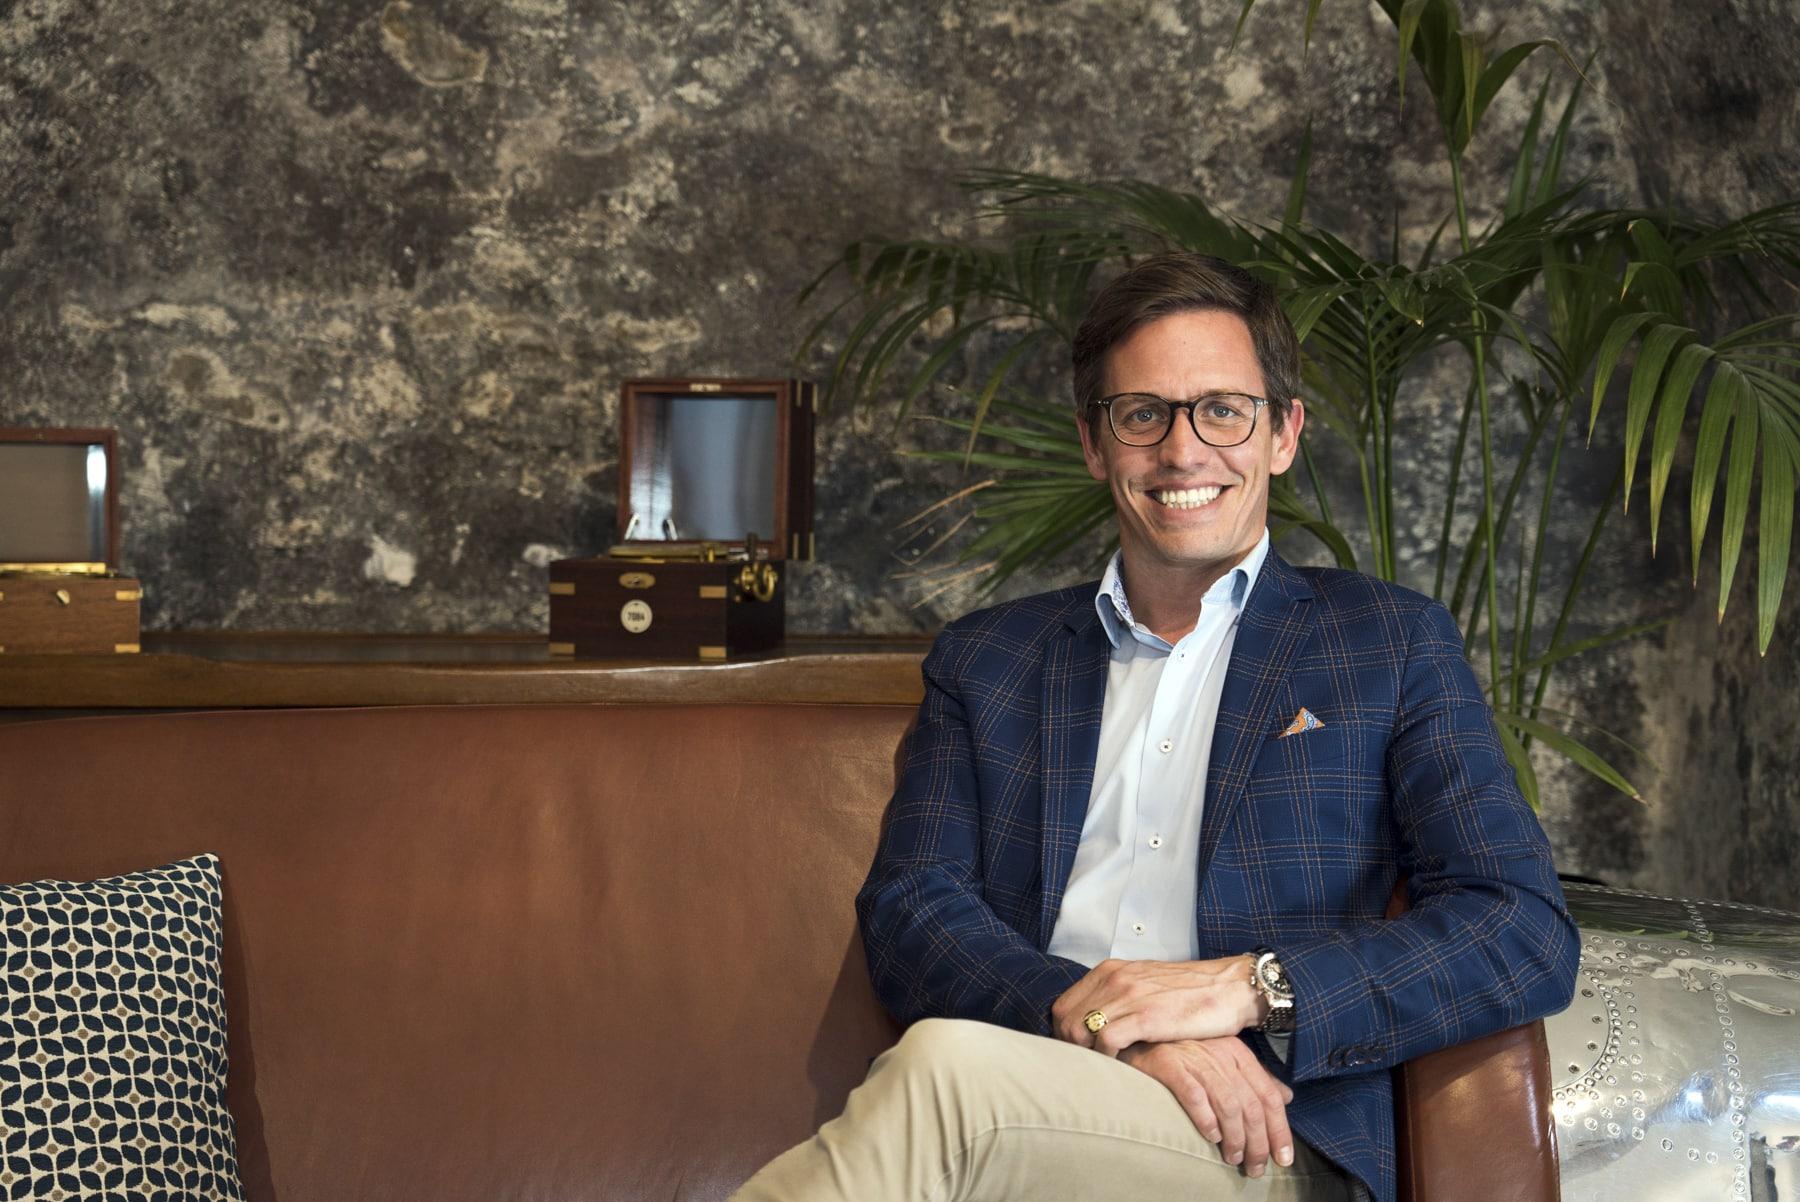 Yannick Meylan, Director